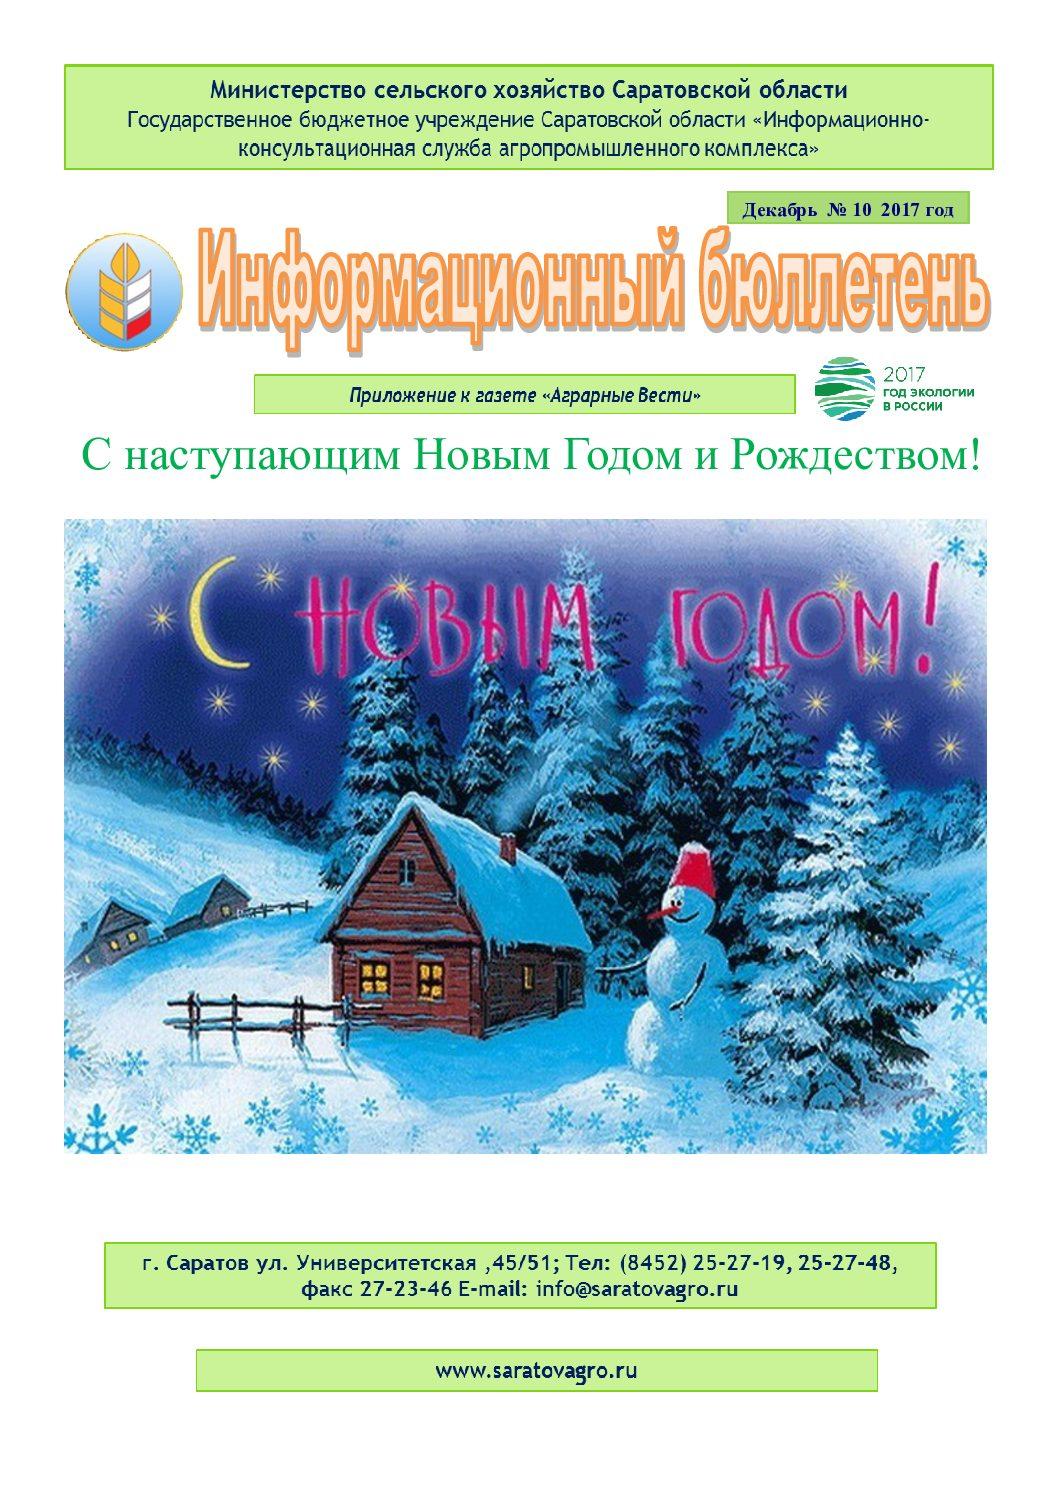 https://saratovagro.ru/wp-content/uploads/2020/08/10.2017-pdf.jpg